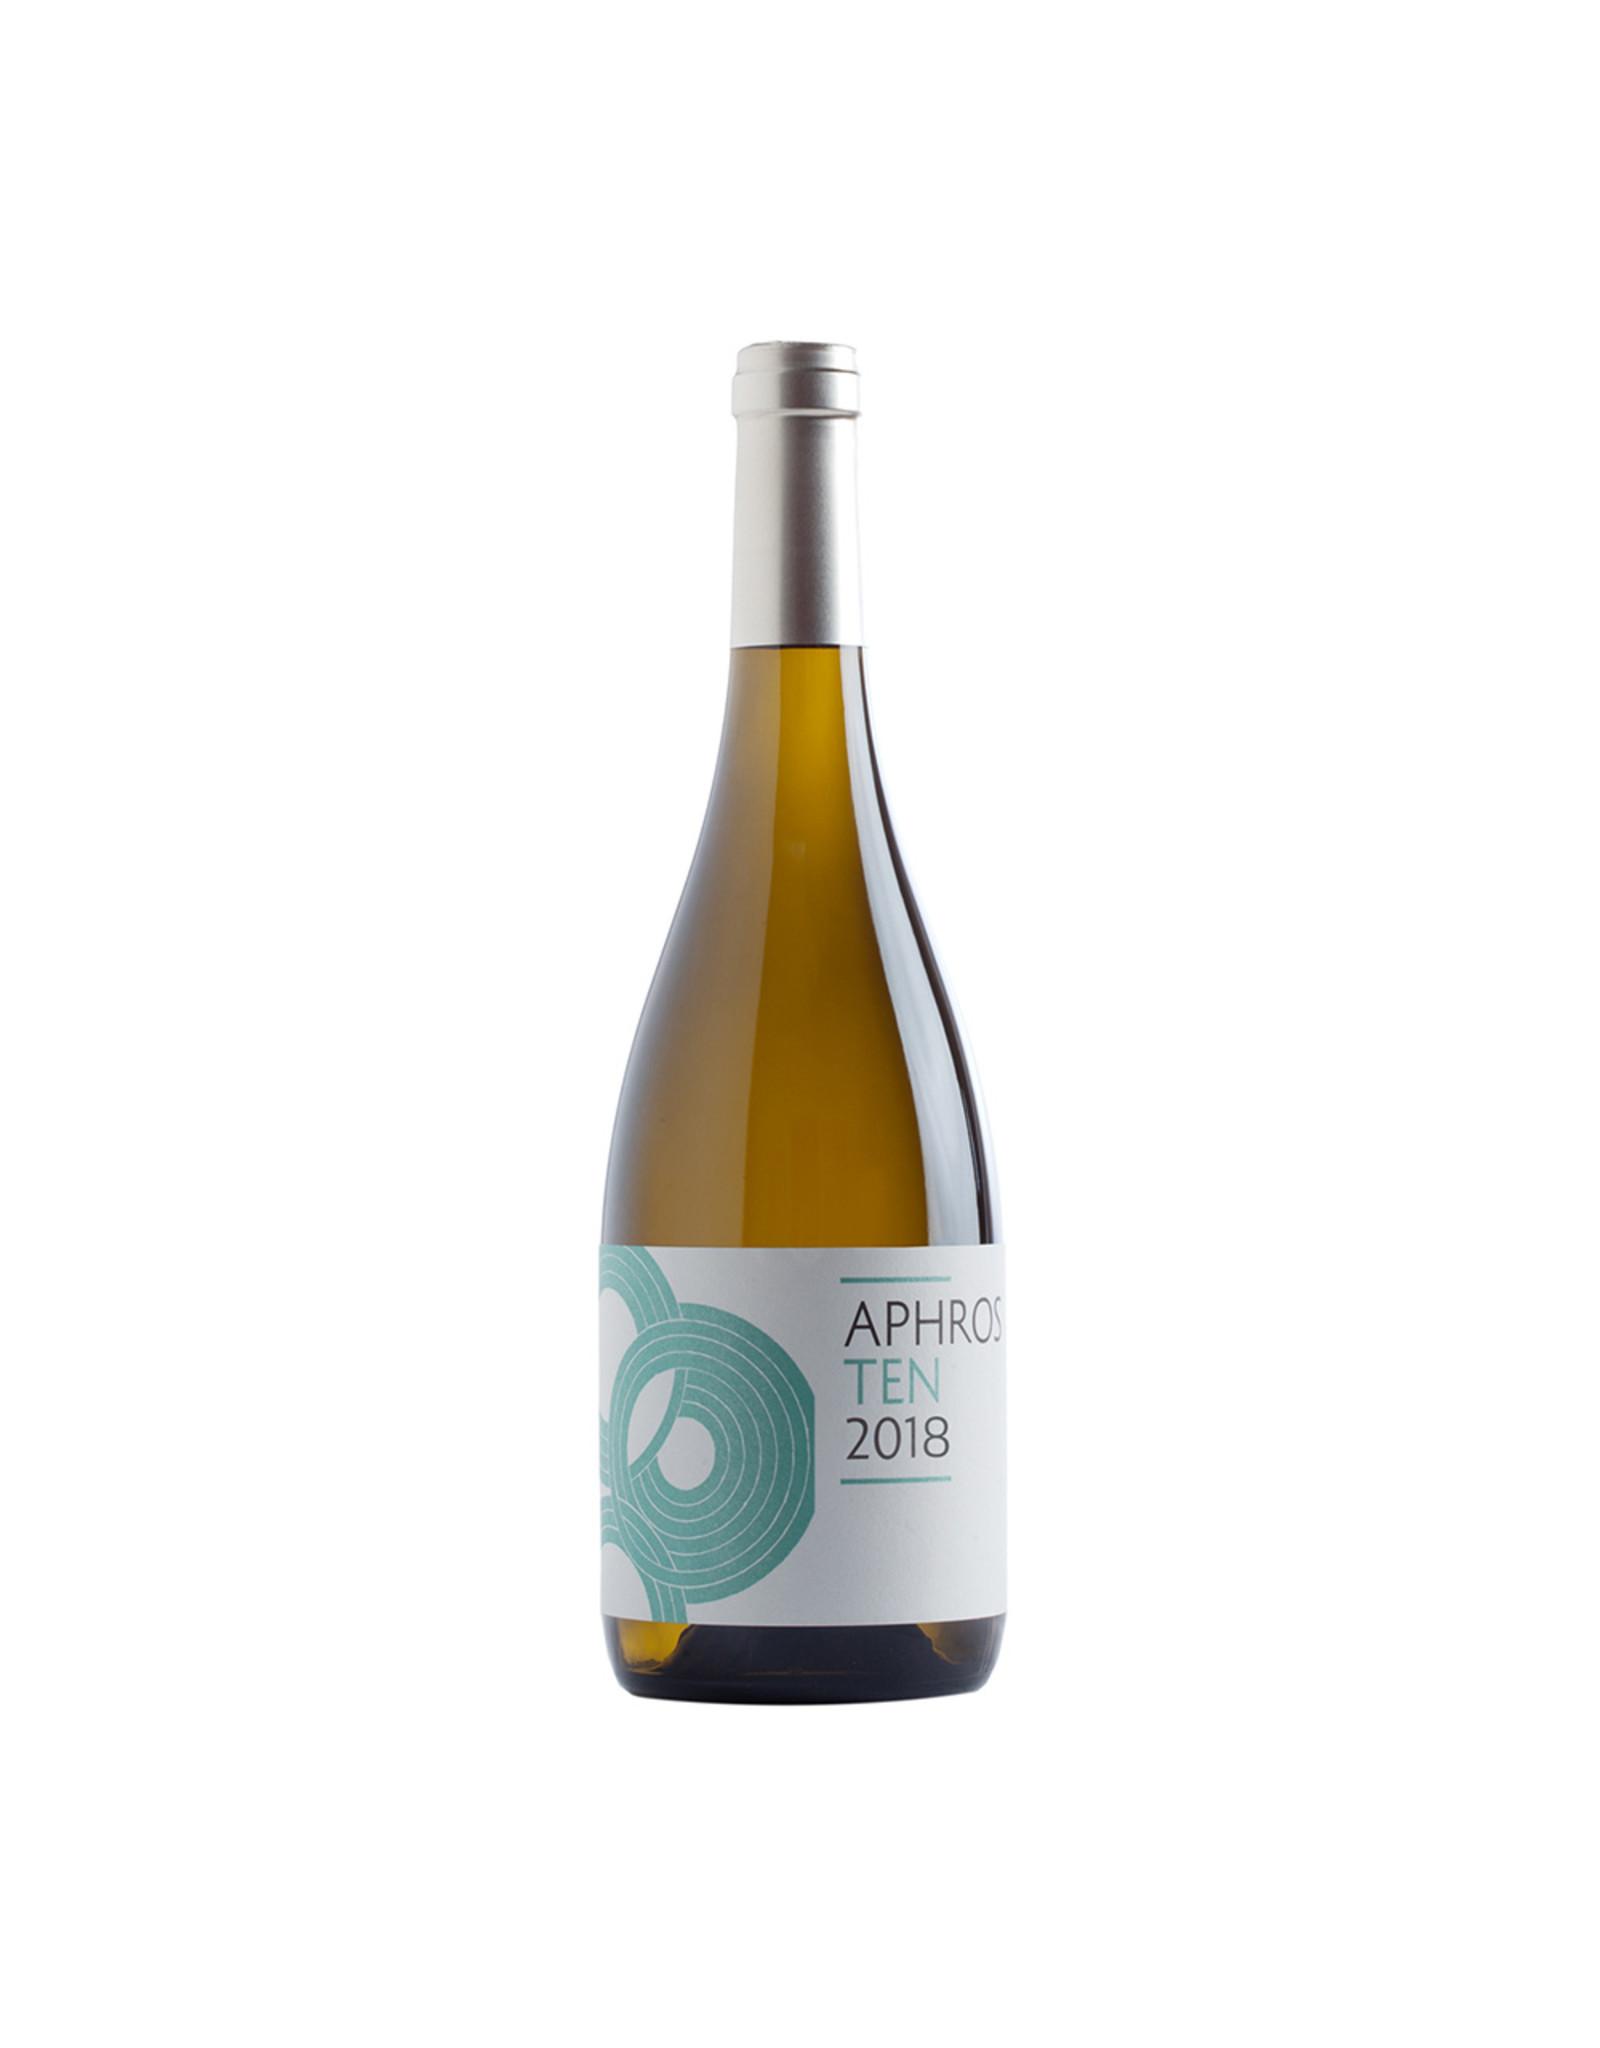 Aphros Ten Vinho Verde